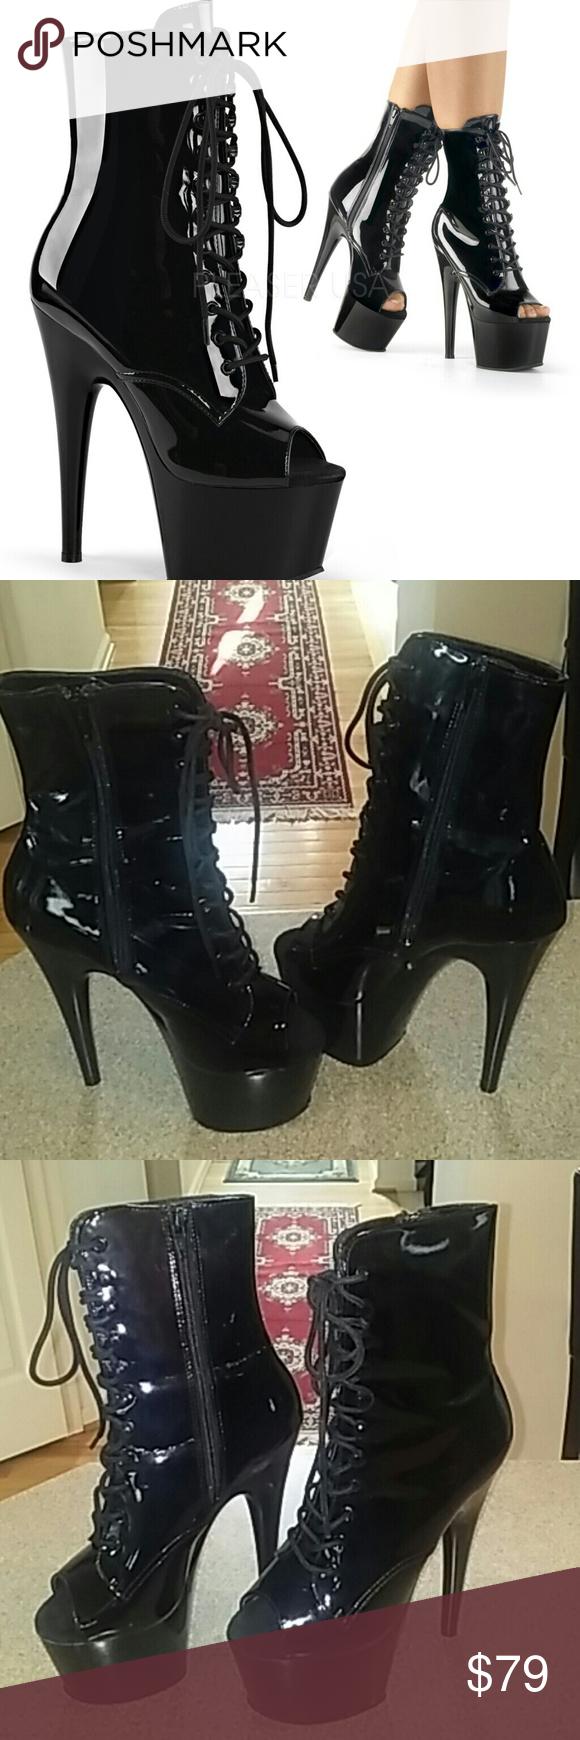 a2e9377f85921 Pleaser Adore-1021 Stiletto platform boots 🔥 🔥 🔥Heel Height: Approx. 7